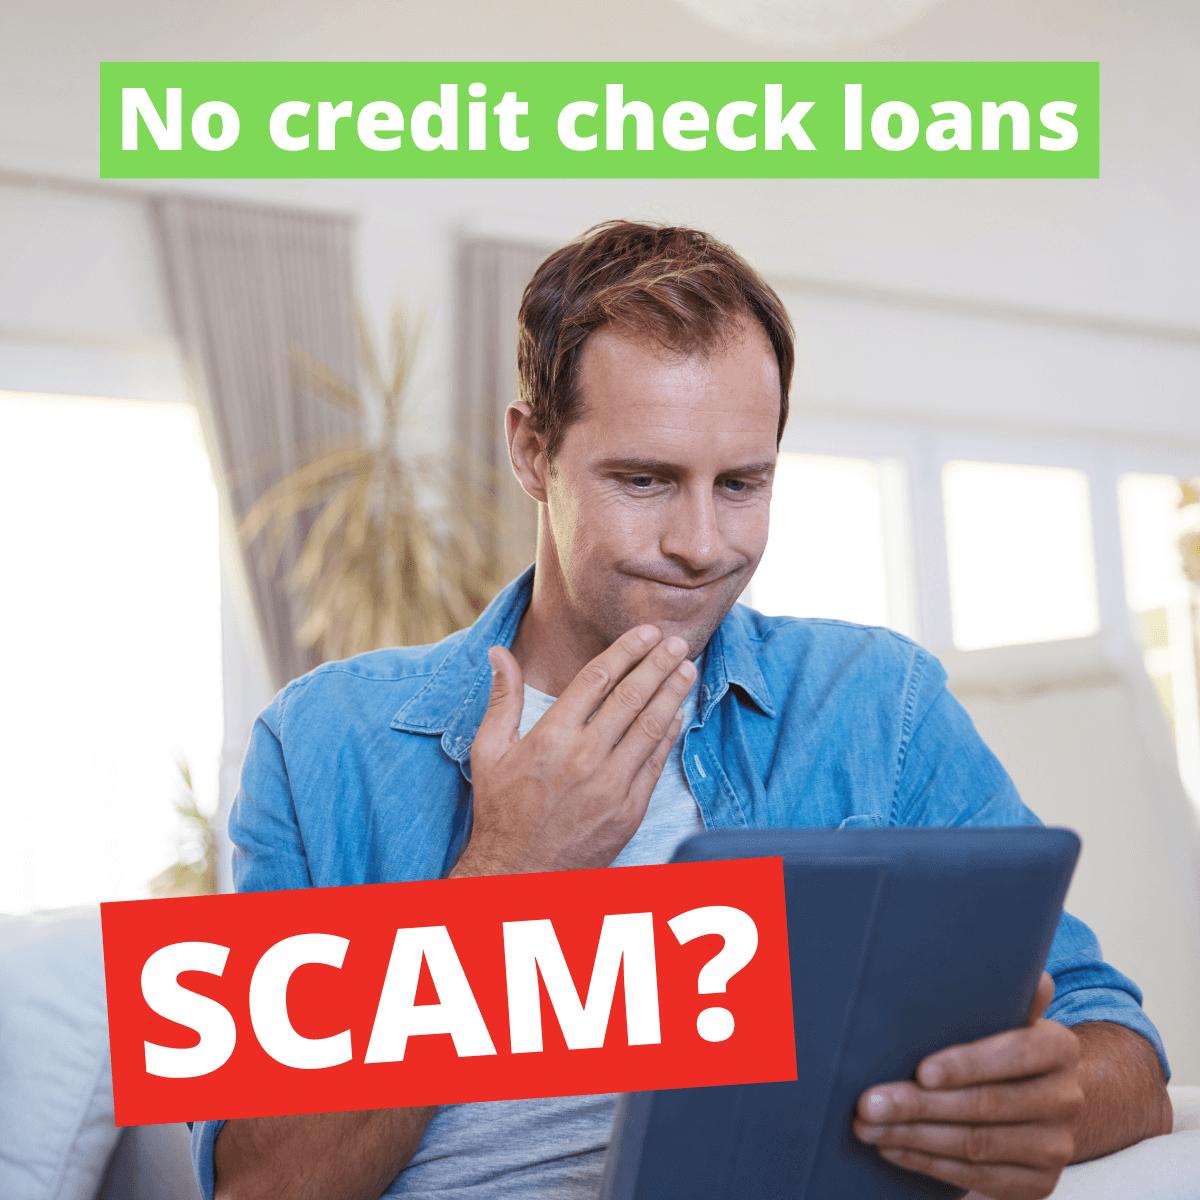 Are No Credit Check Loans a Scam?